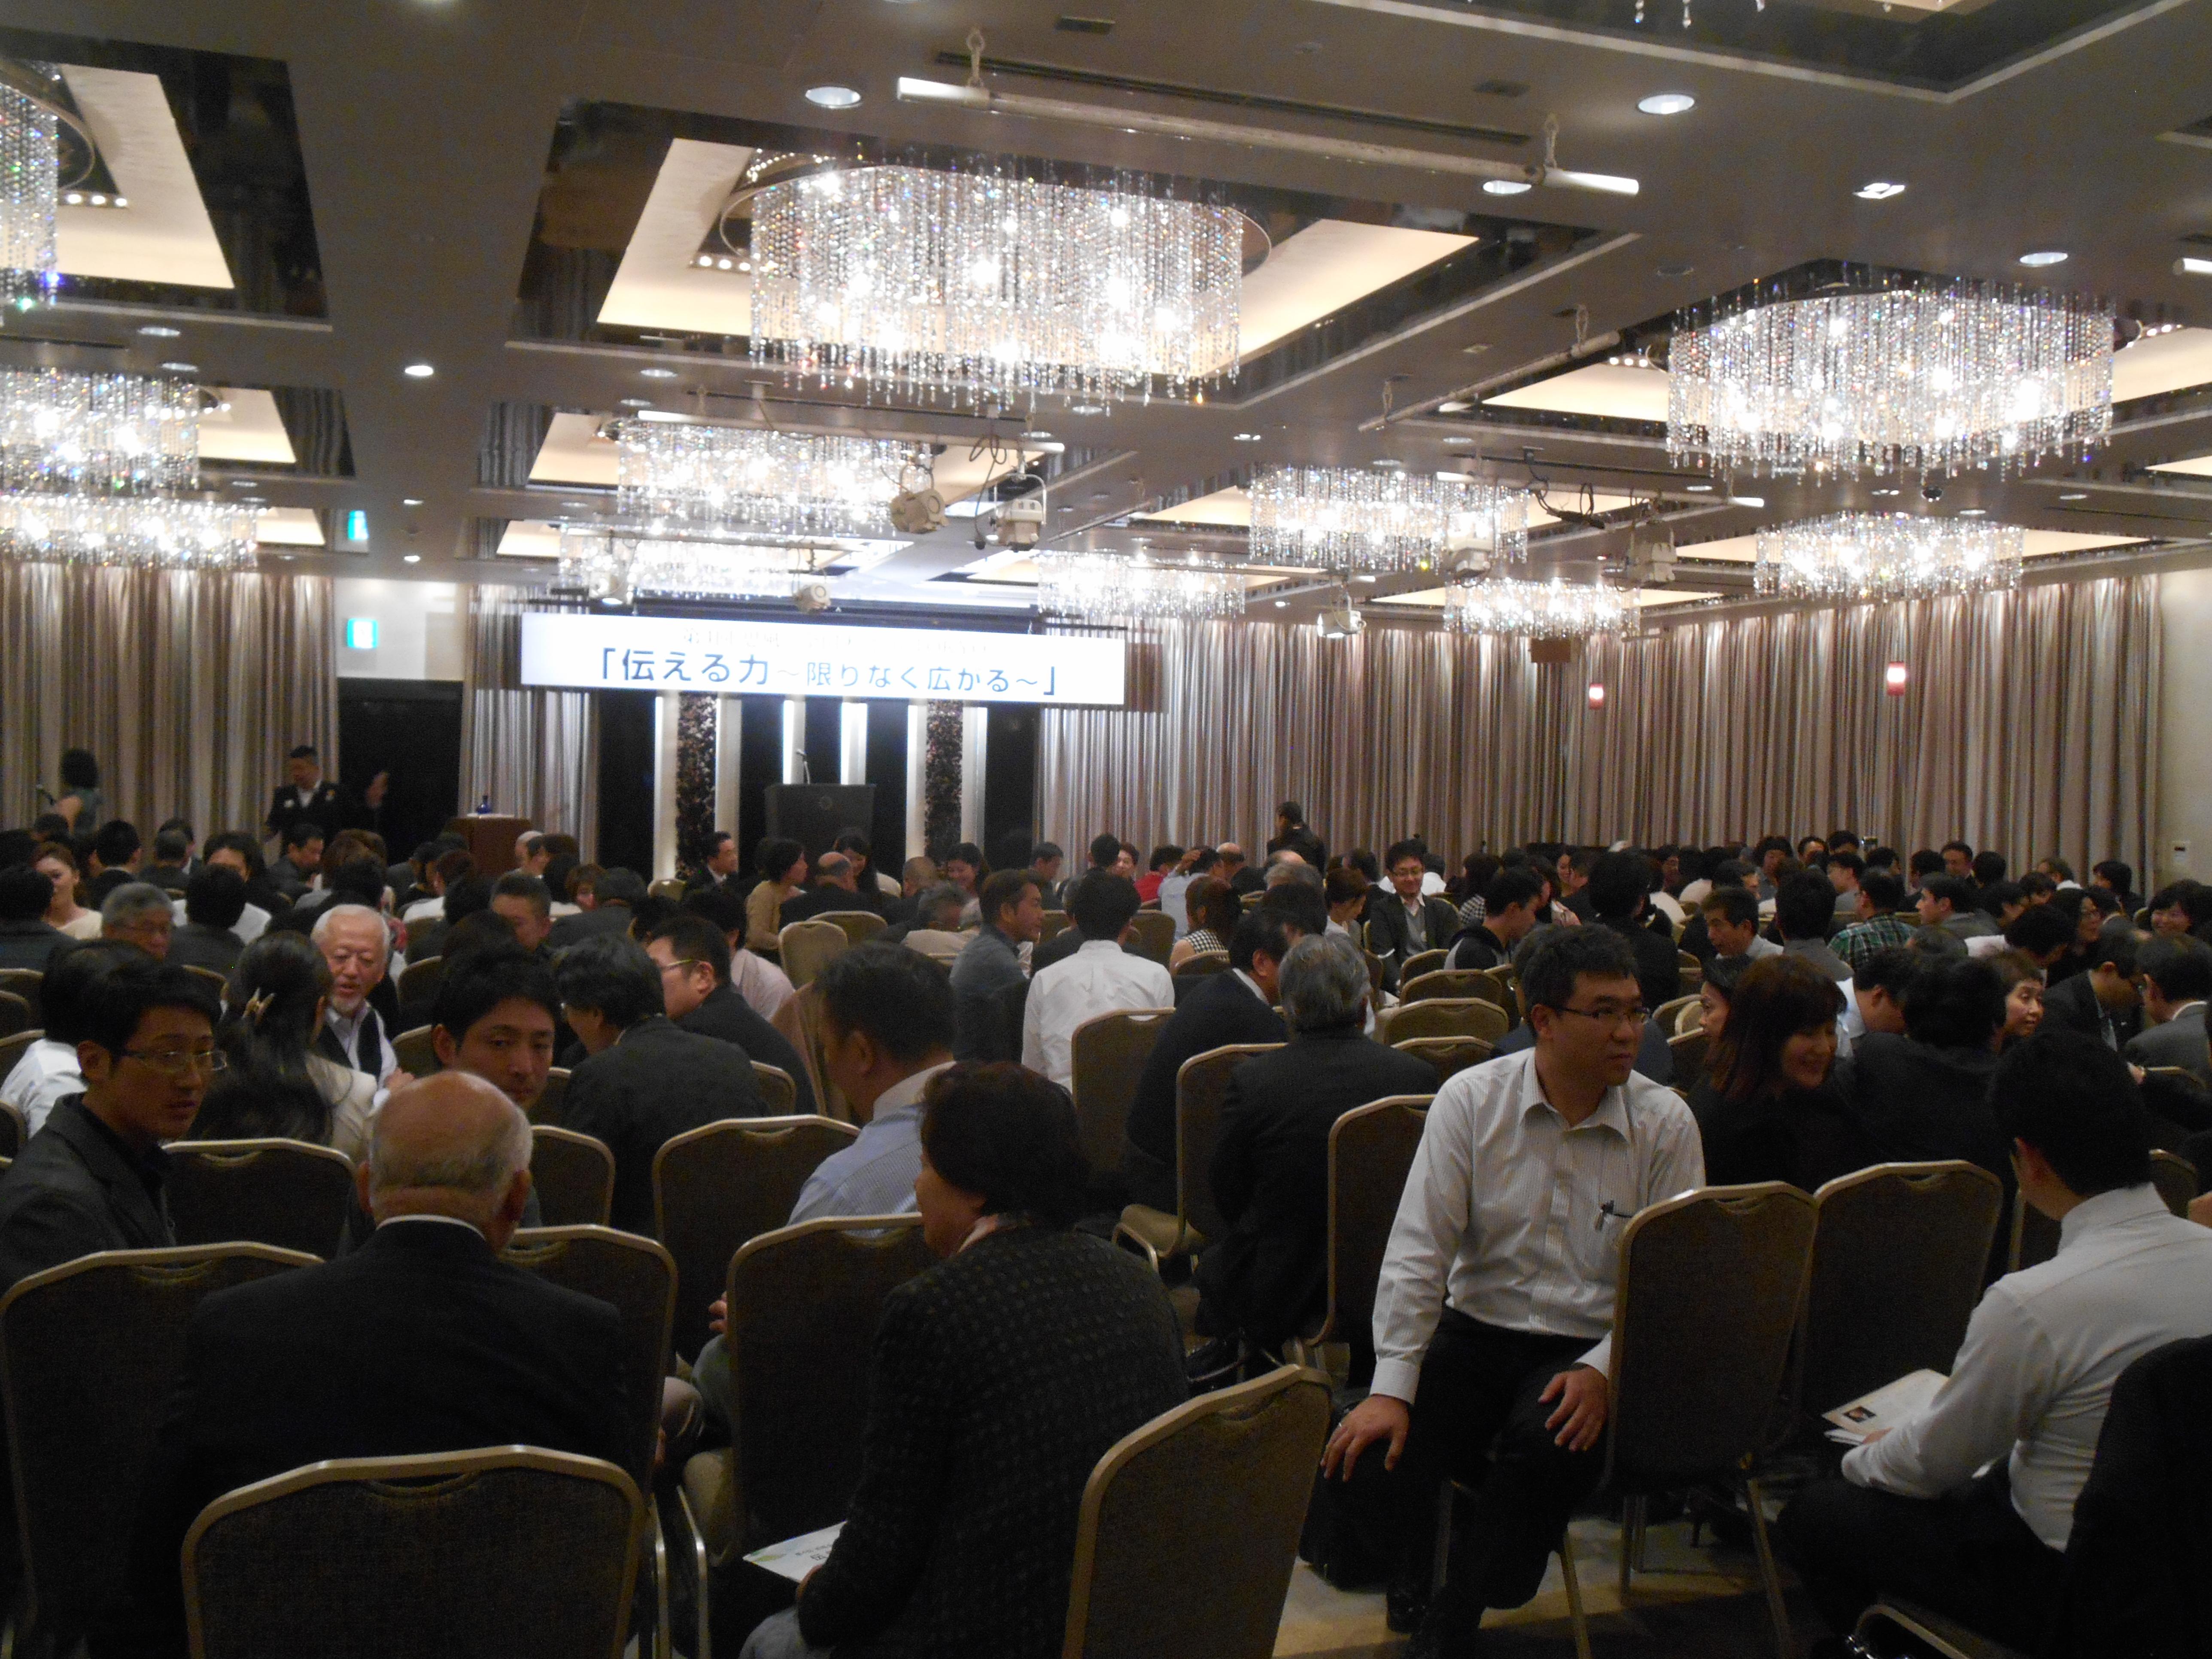 DSCN2095 - 平成30年度 東京思風塾 4月7日(土)「時代が問題をつくり、問題が人物をつくる」